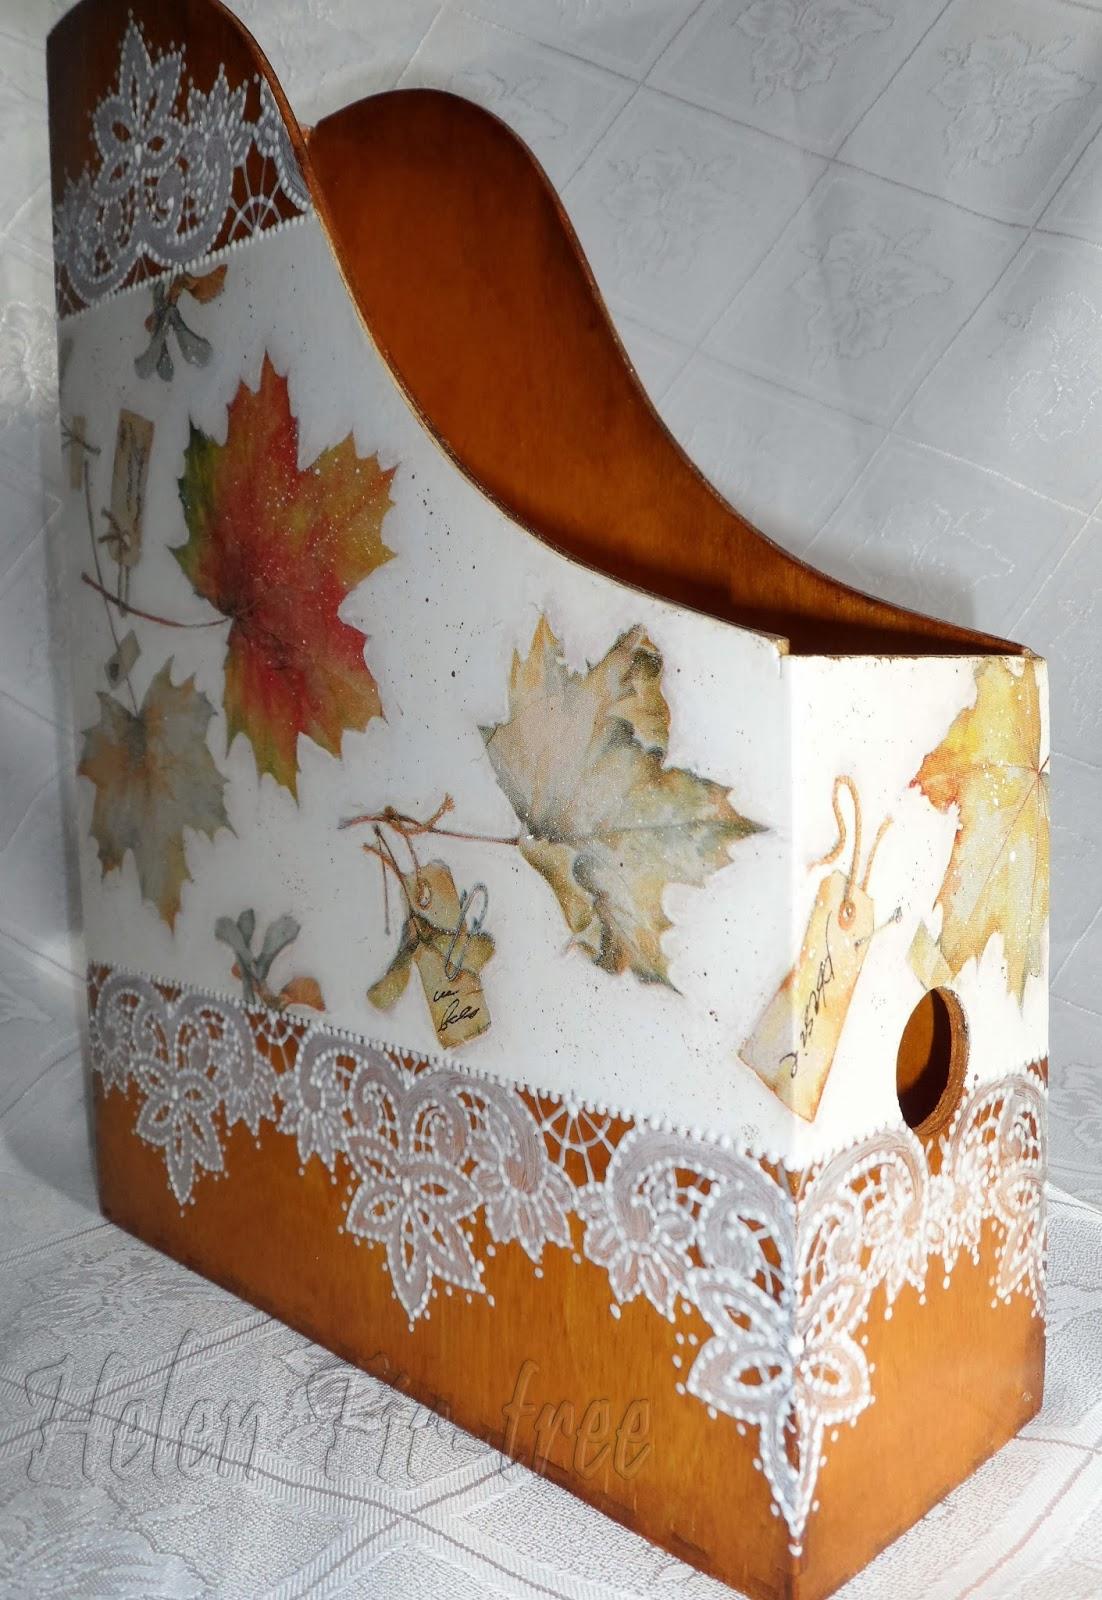 Helen Fir-tree декупаж журнальница Осень decoupage Magazine rack Autumn